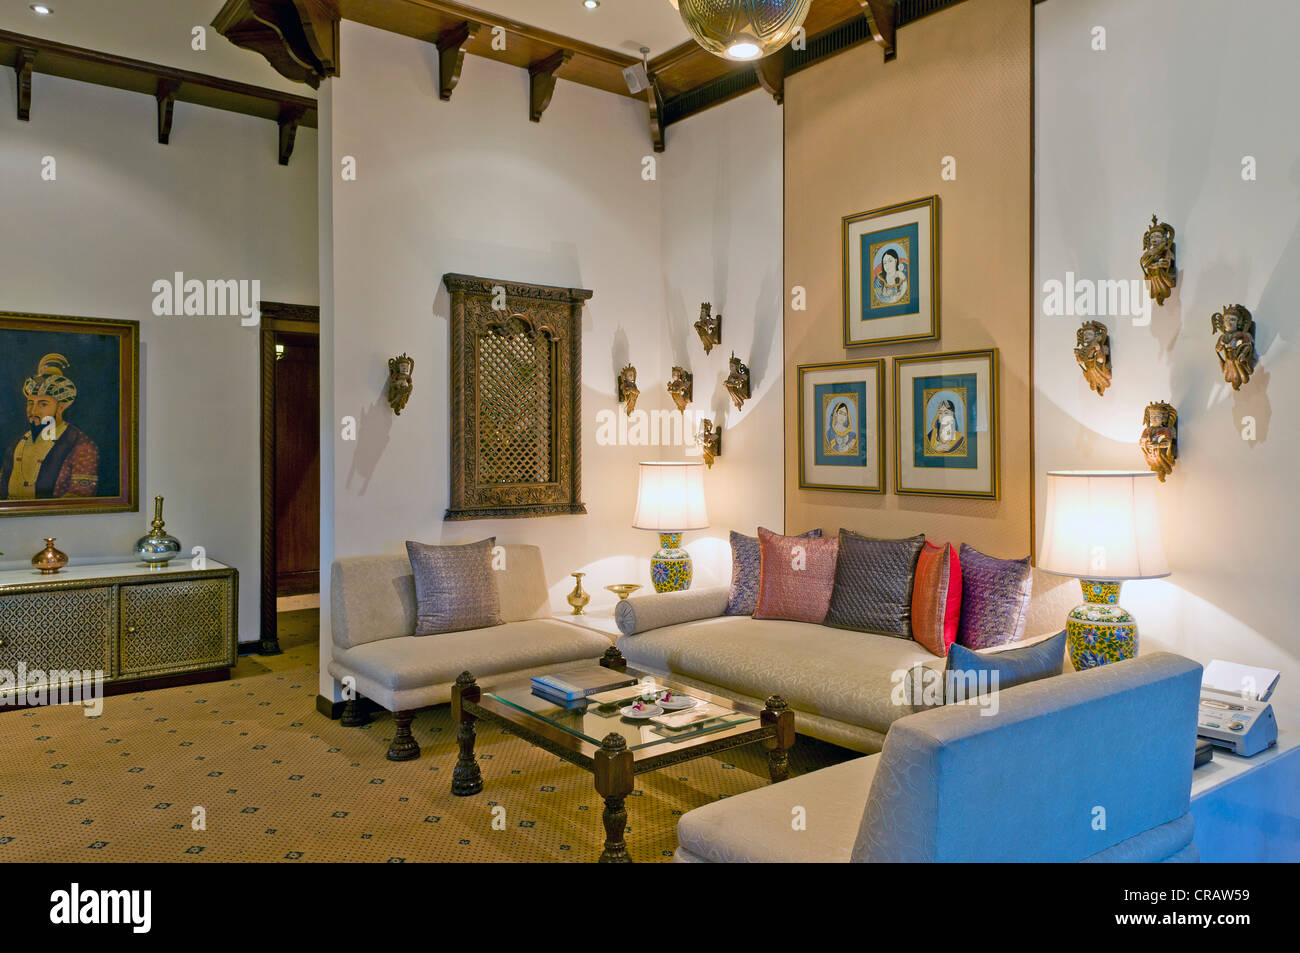 Rajput Suite Hotel Taj Mahal, Colaba district, Mumbai, Maharashtra, India, Asia Immagini Stock